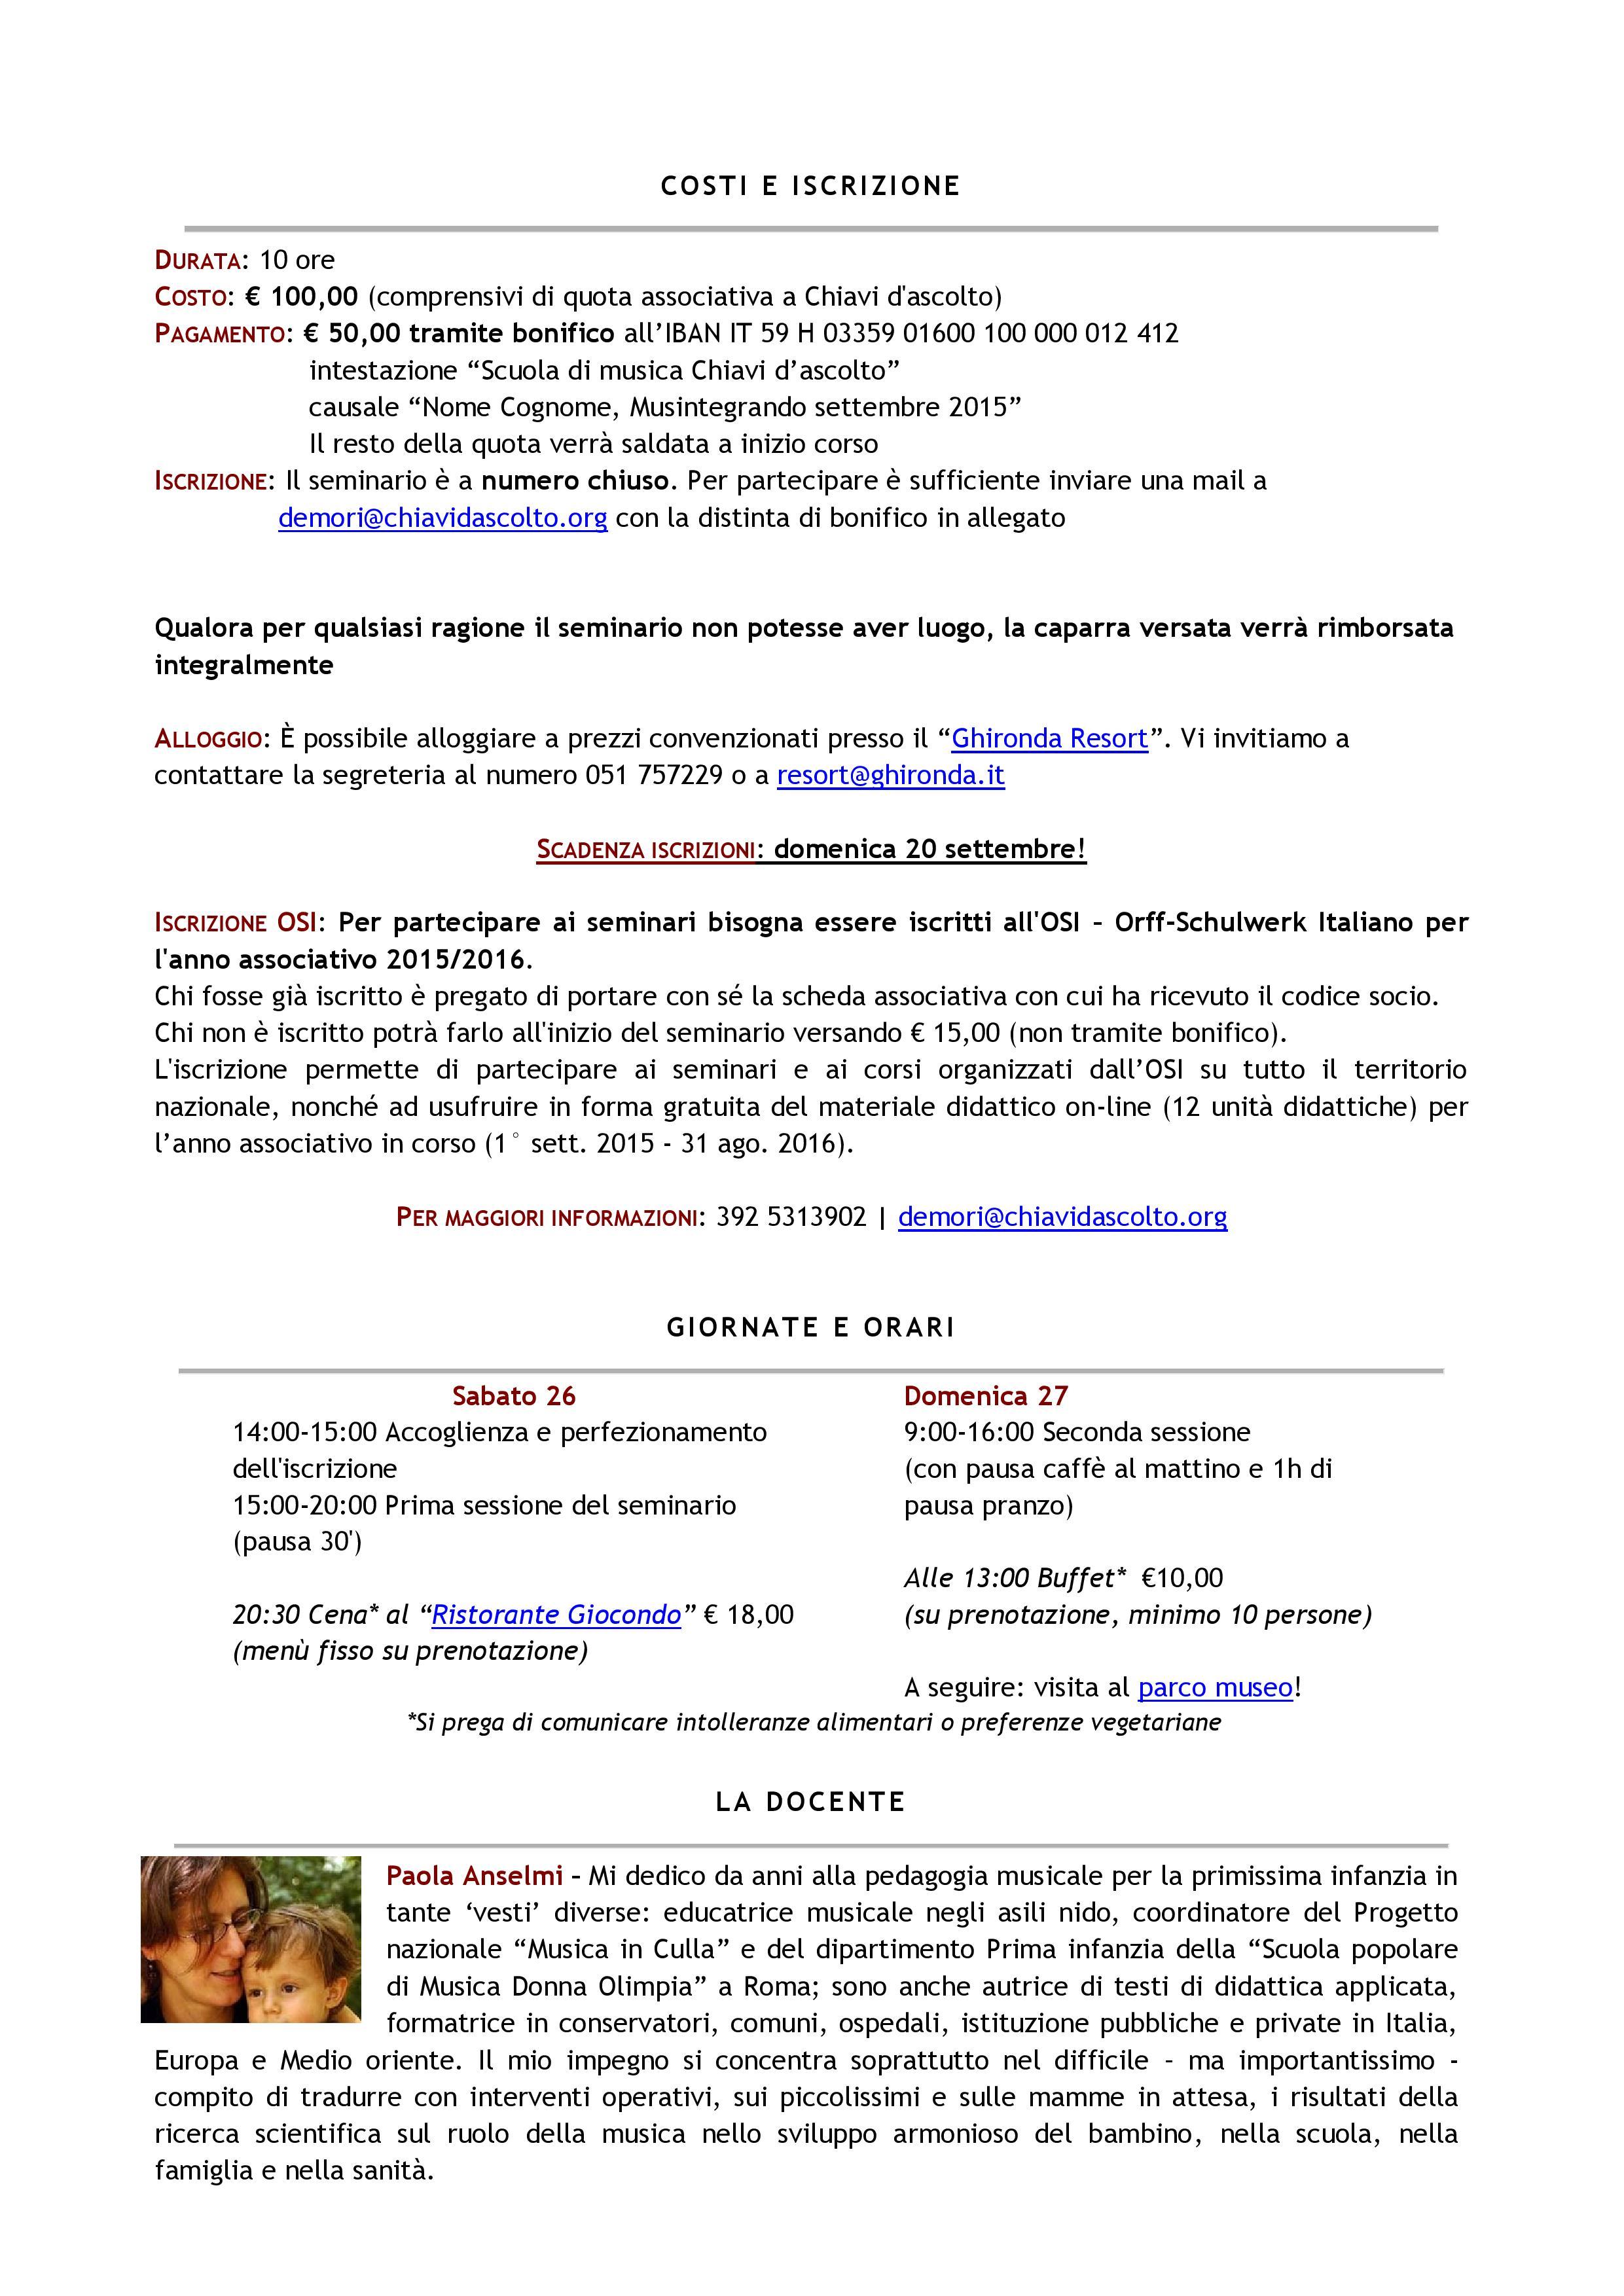 Volantino_MUSINTEGRANDO_Bologna_26-27sett2015-page-002